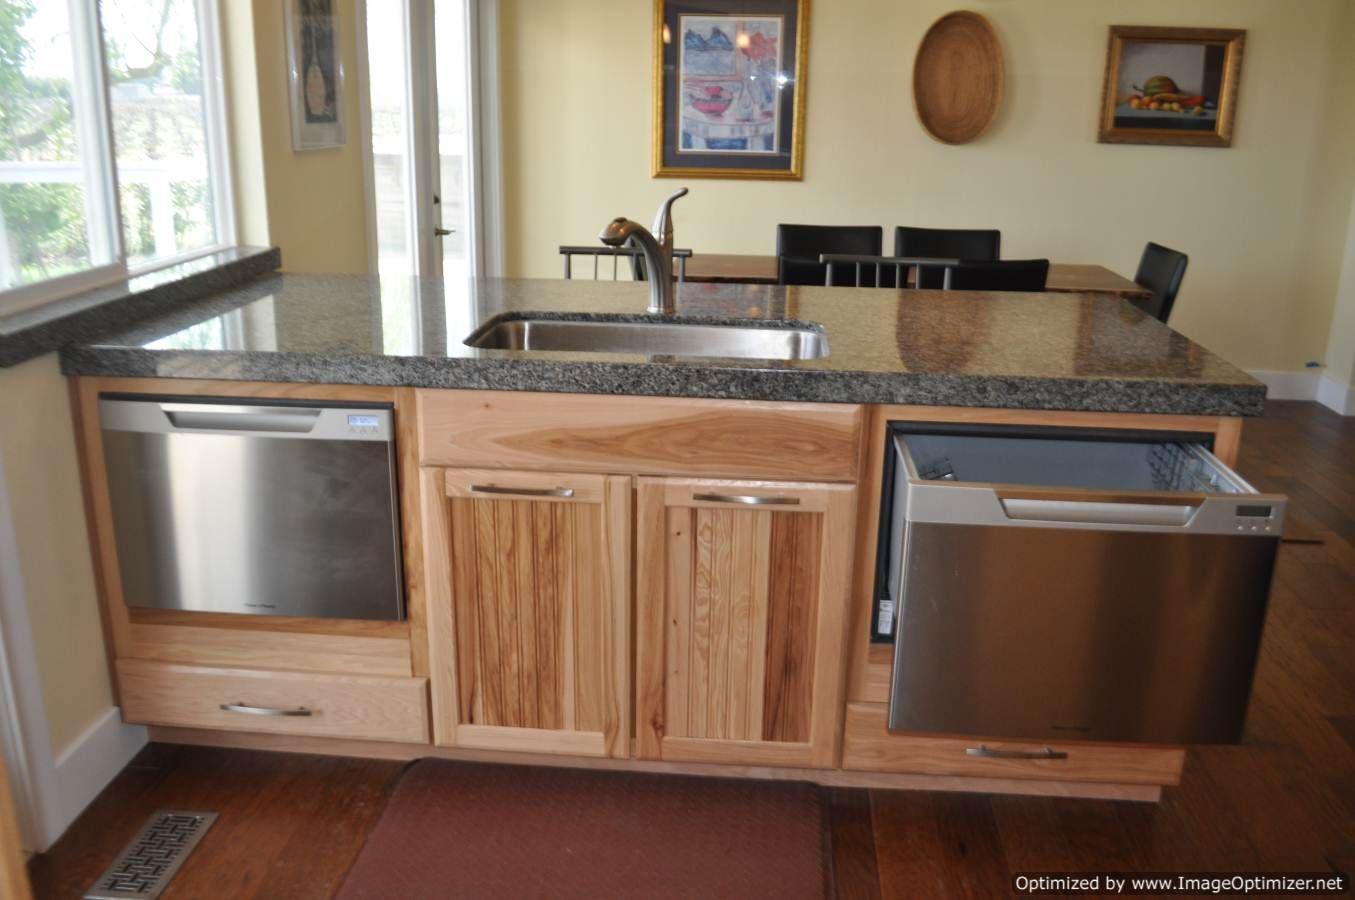 Evansdishwashers With Images Under Sink Drawer Kitchen